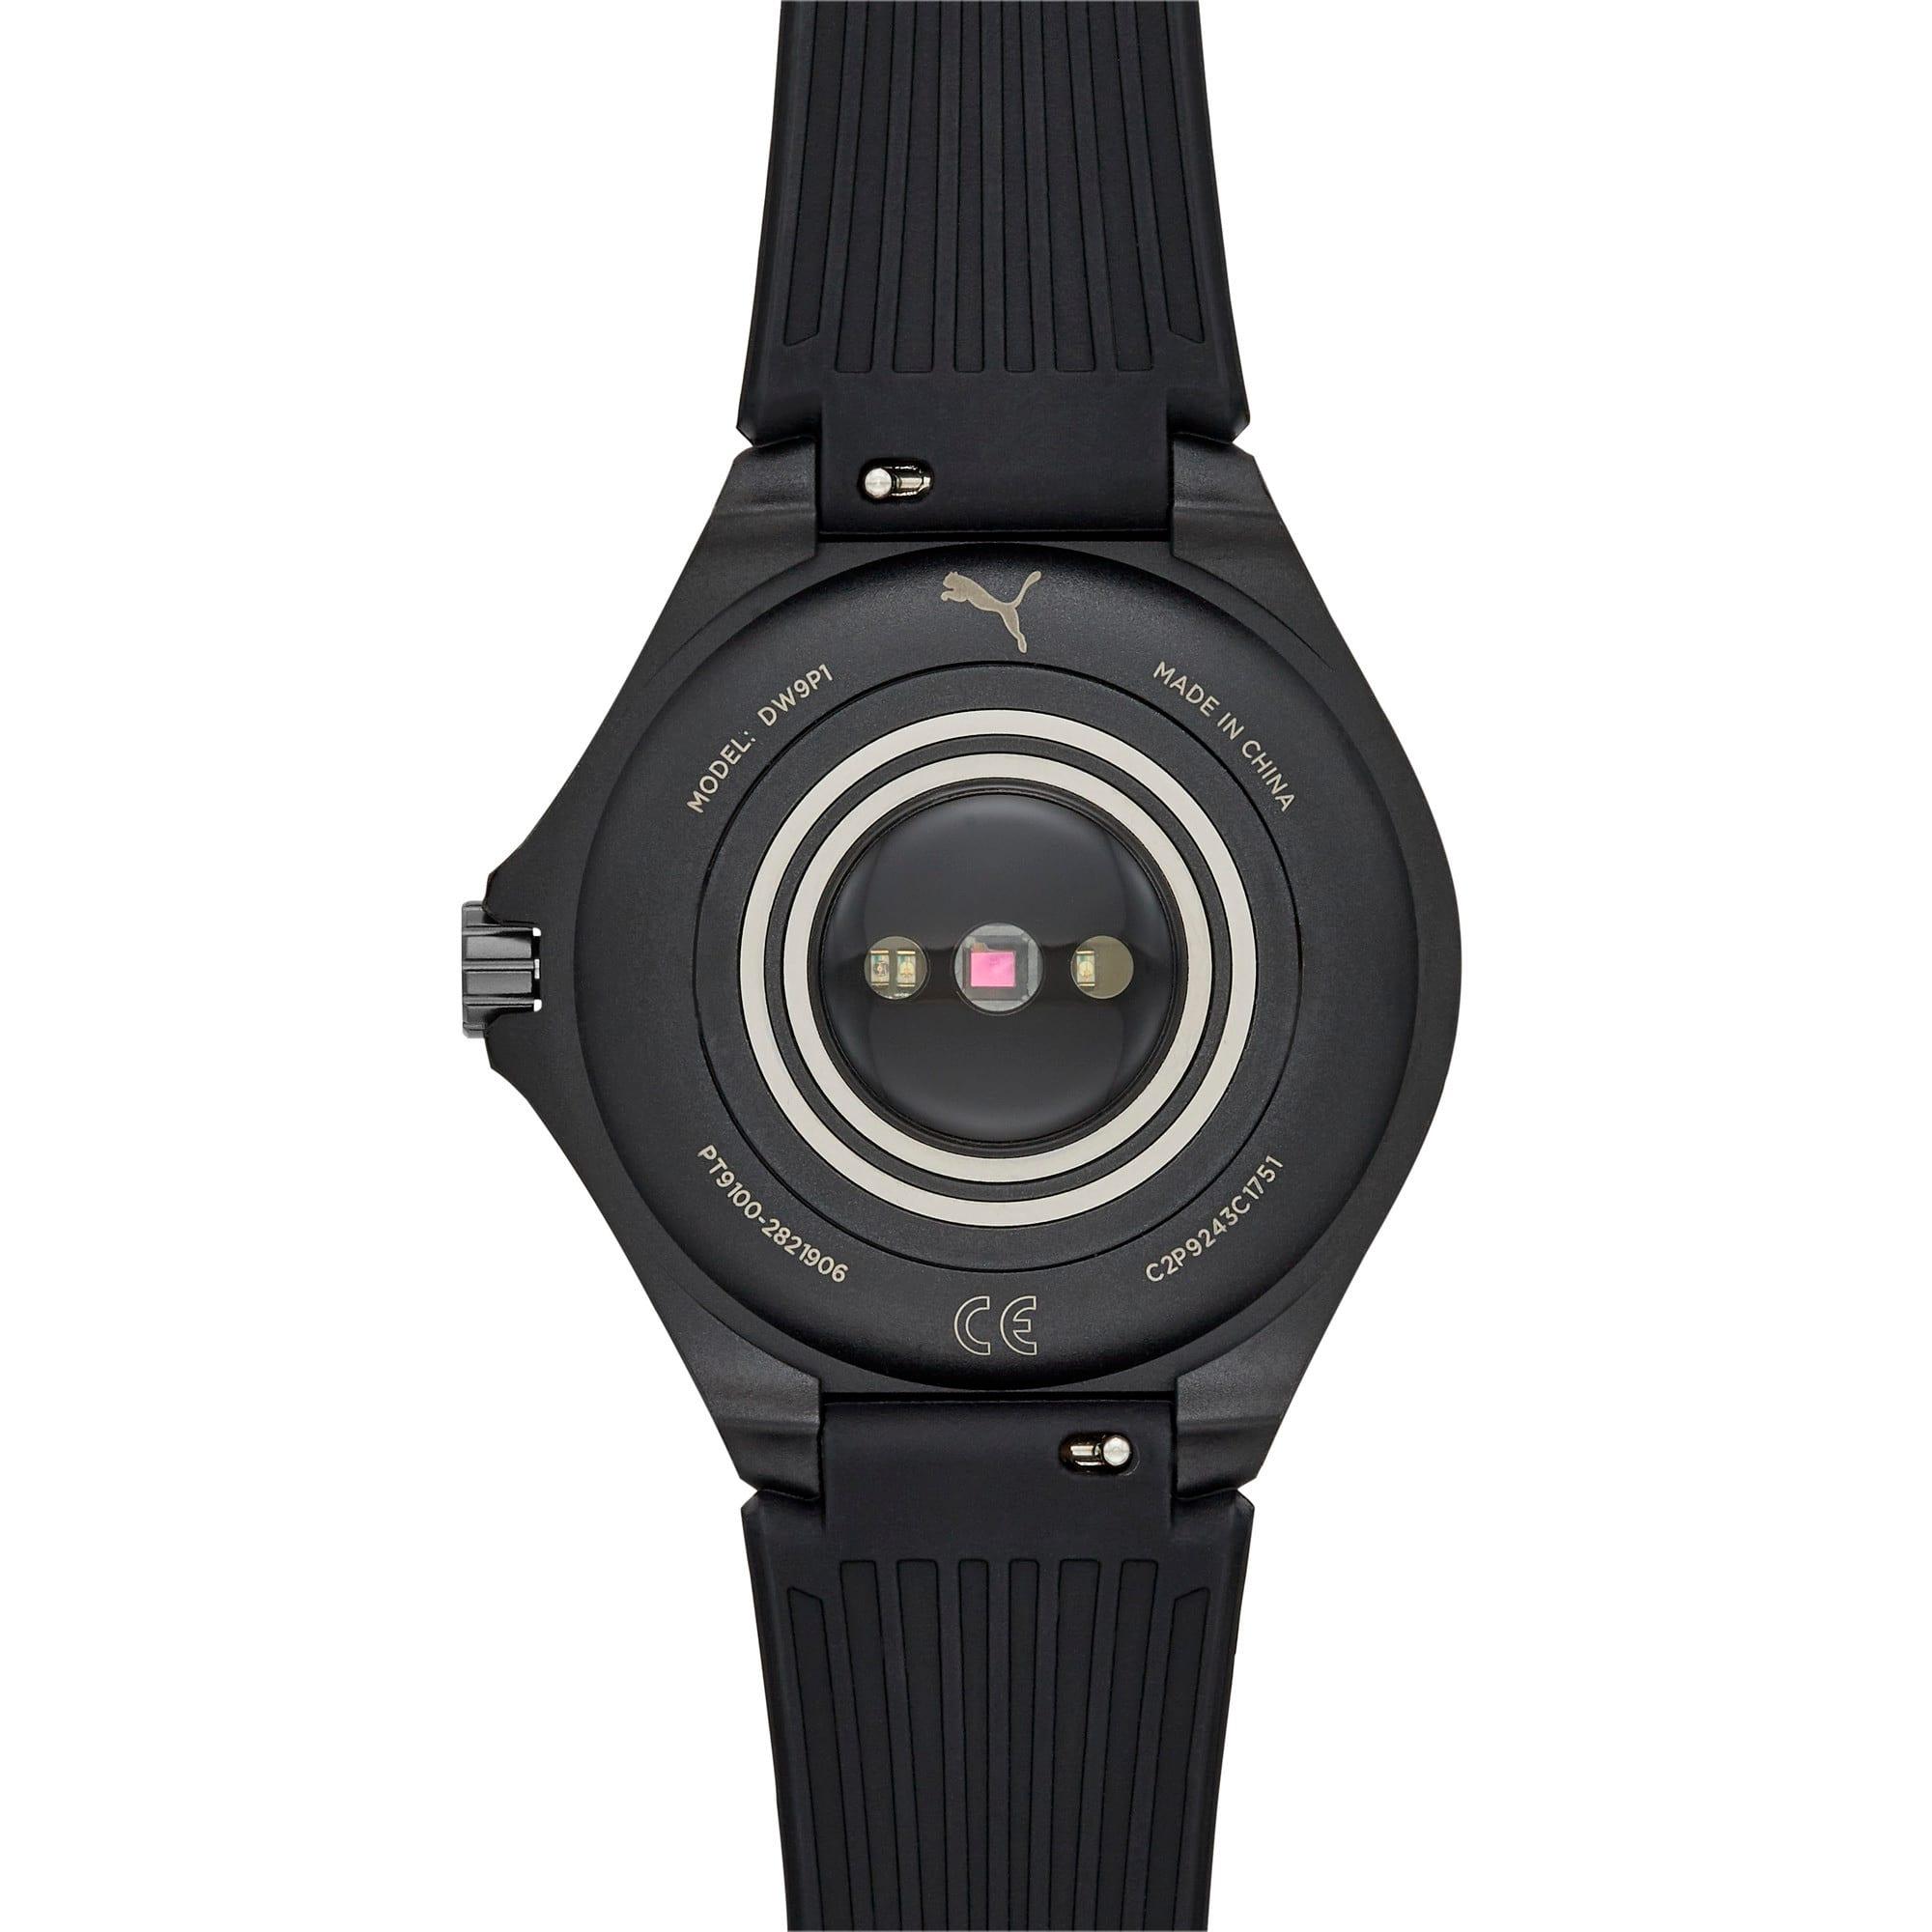 Thumbnail 4 of PUMA Smartwatch, Black/Gray, medium